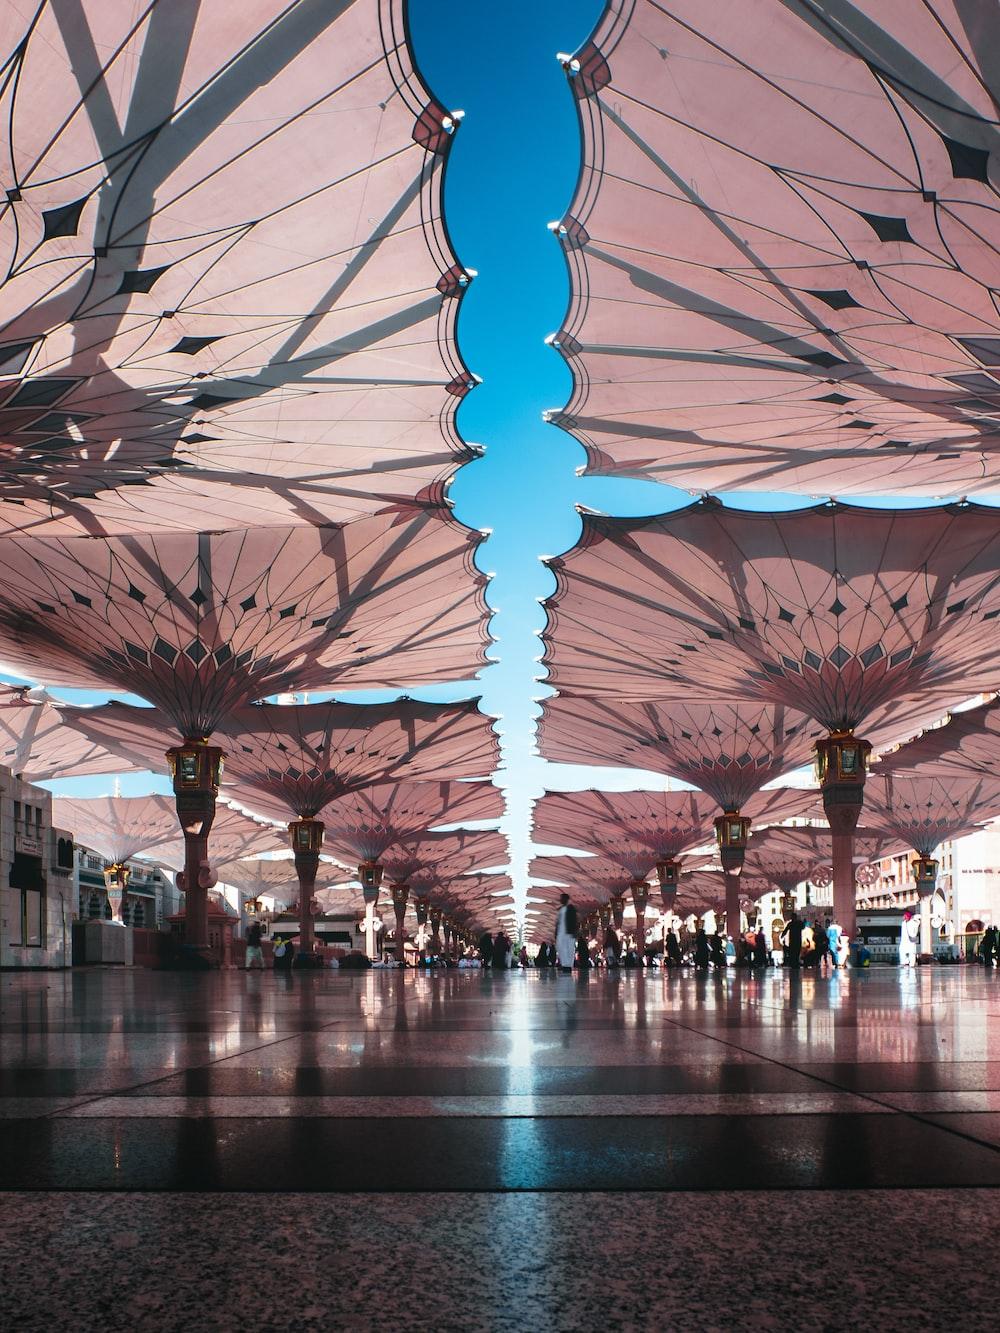 Al Masjid An Nabawi Medina Saudi Arabia Pictures Download Free